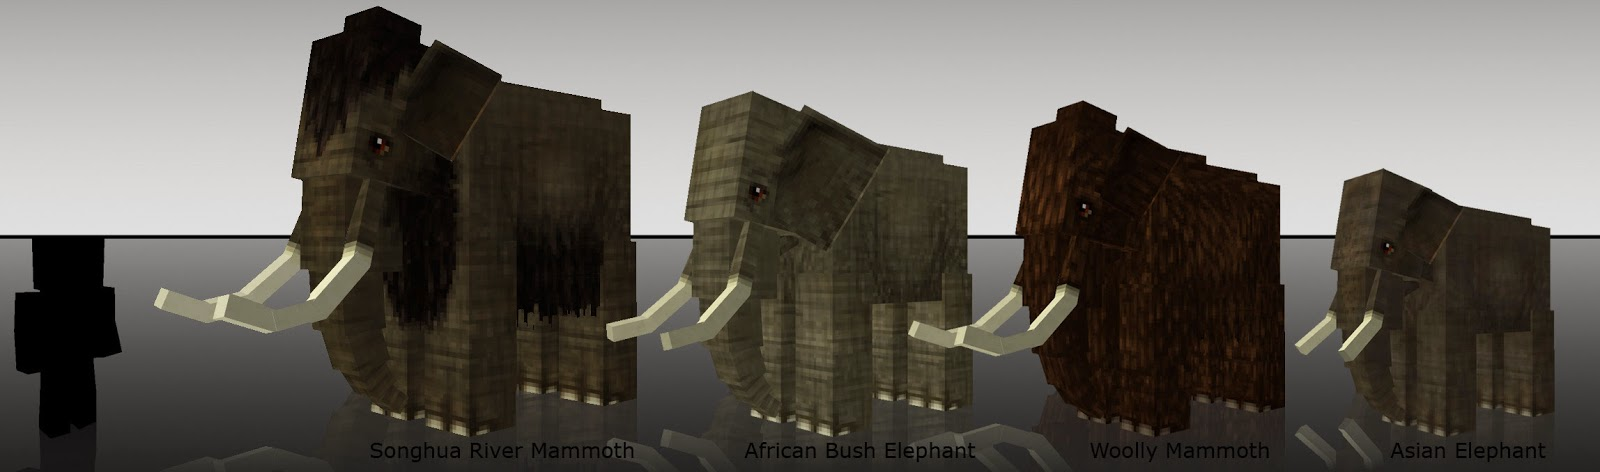 Mo' Creatures Elefantes y mamuts Minecraft mod